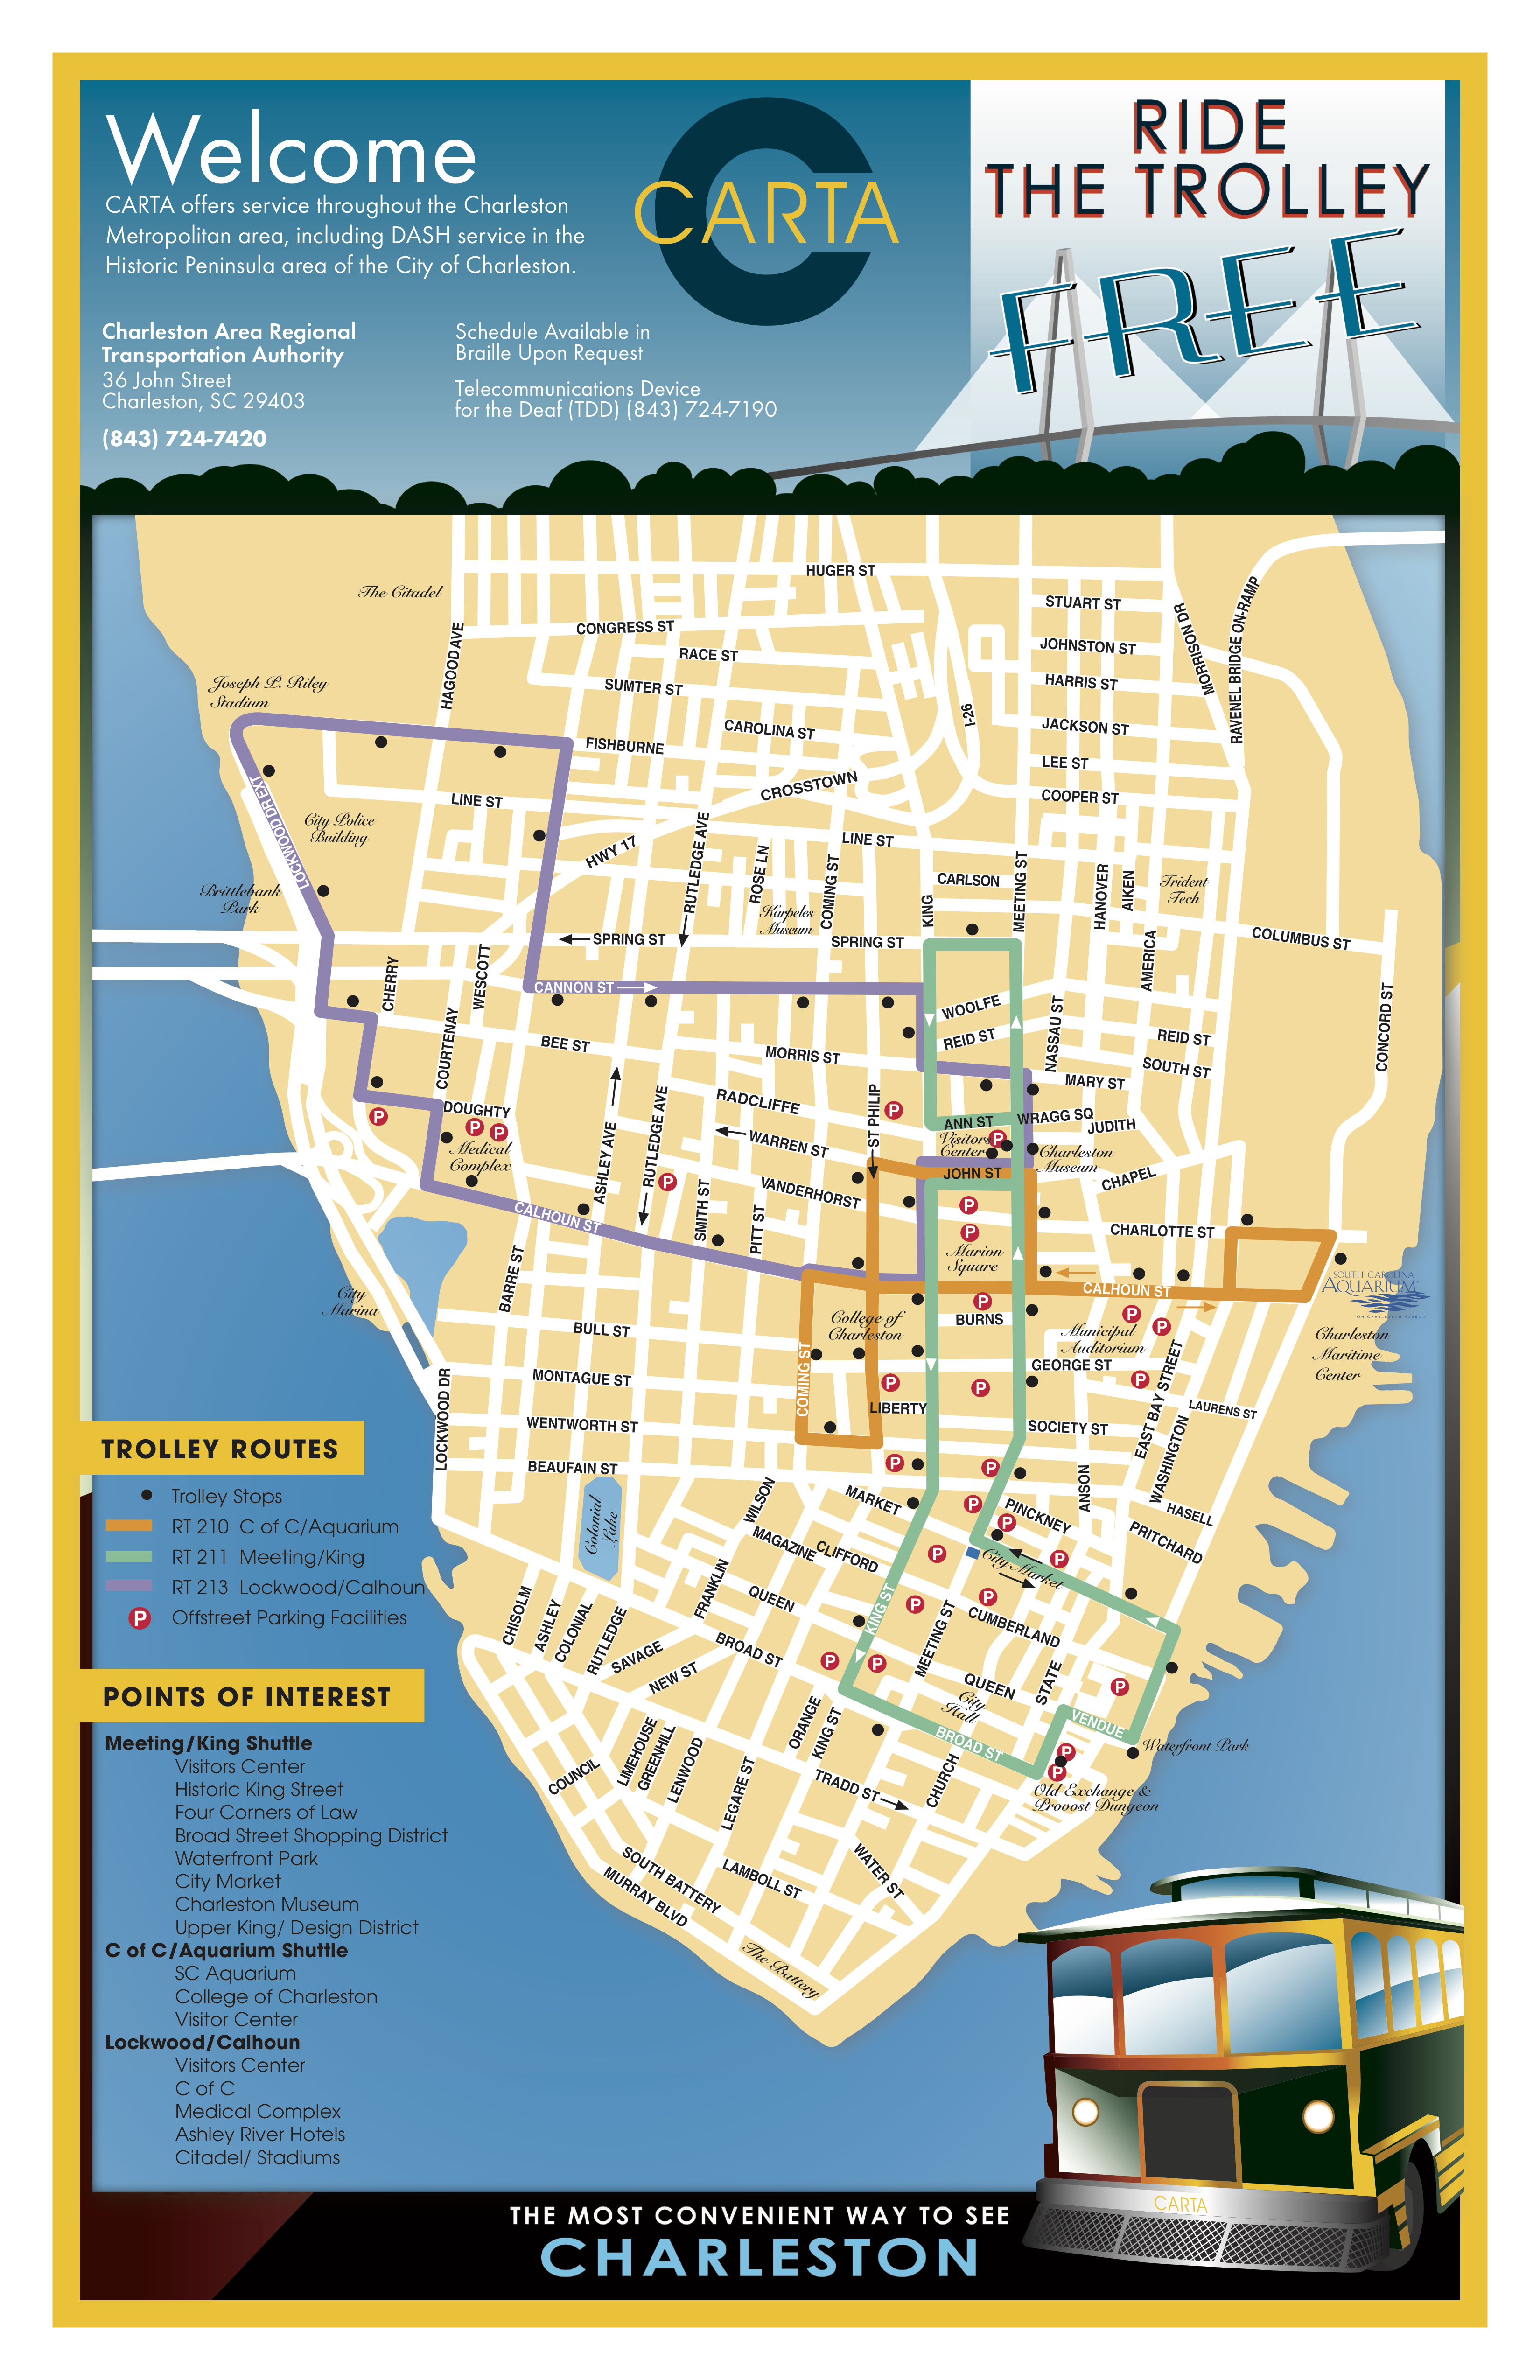 CARTA MAP